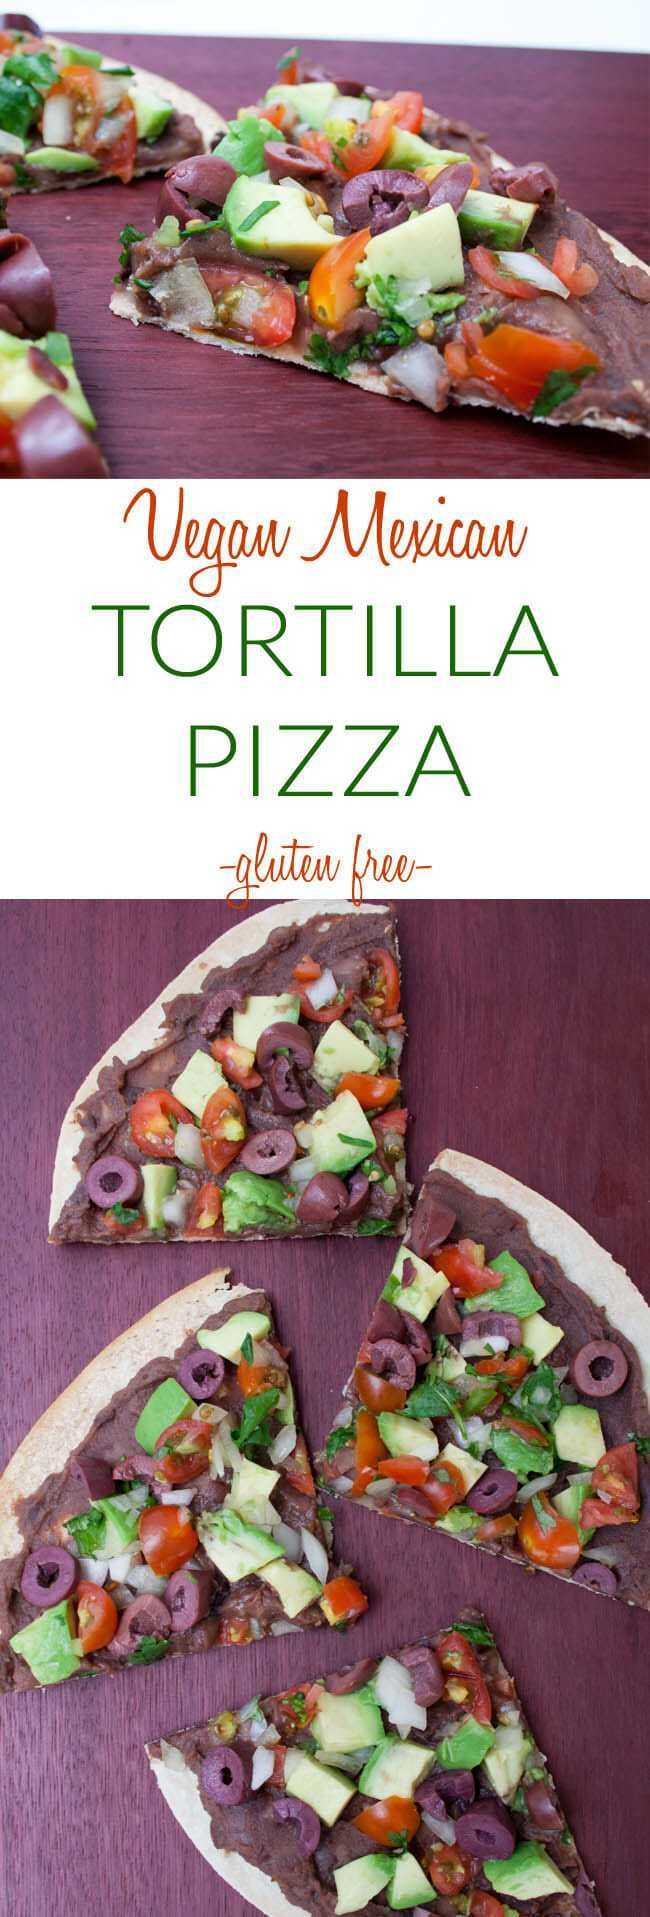 Vegan Mexican Tortilla Pizza (gluten free) – Gluten free Mexican thin crust pizz…